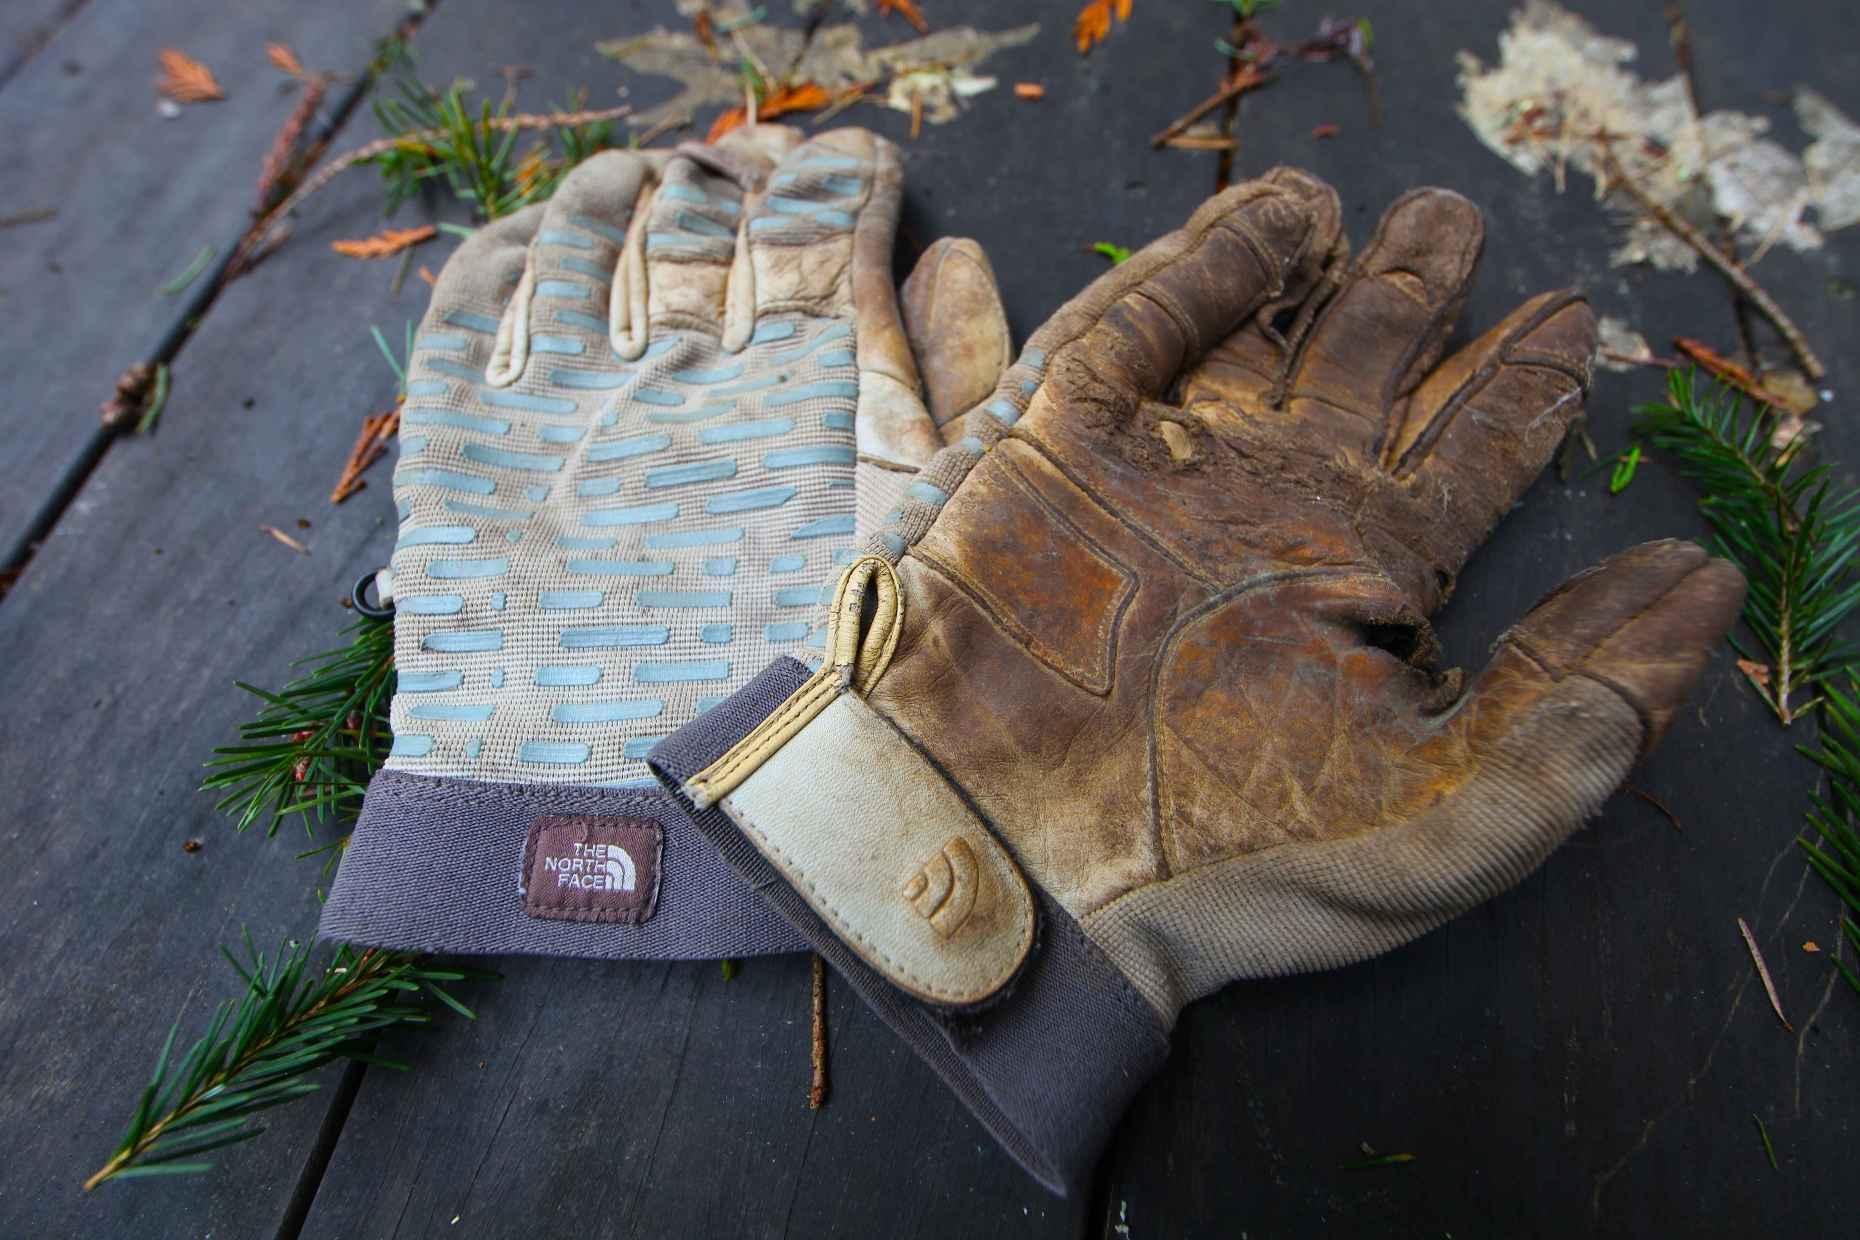 My favorite TNF gloves, now safely in the bin. Photo © Liesl Clark